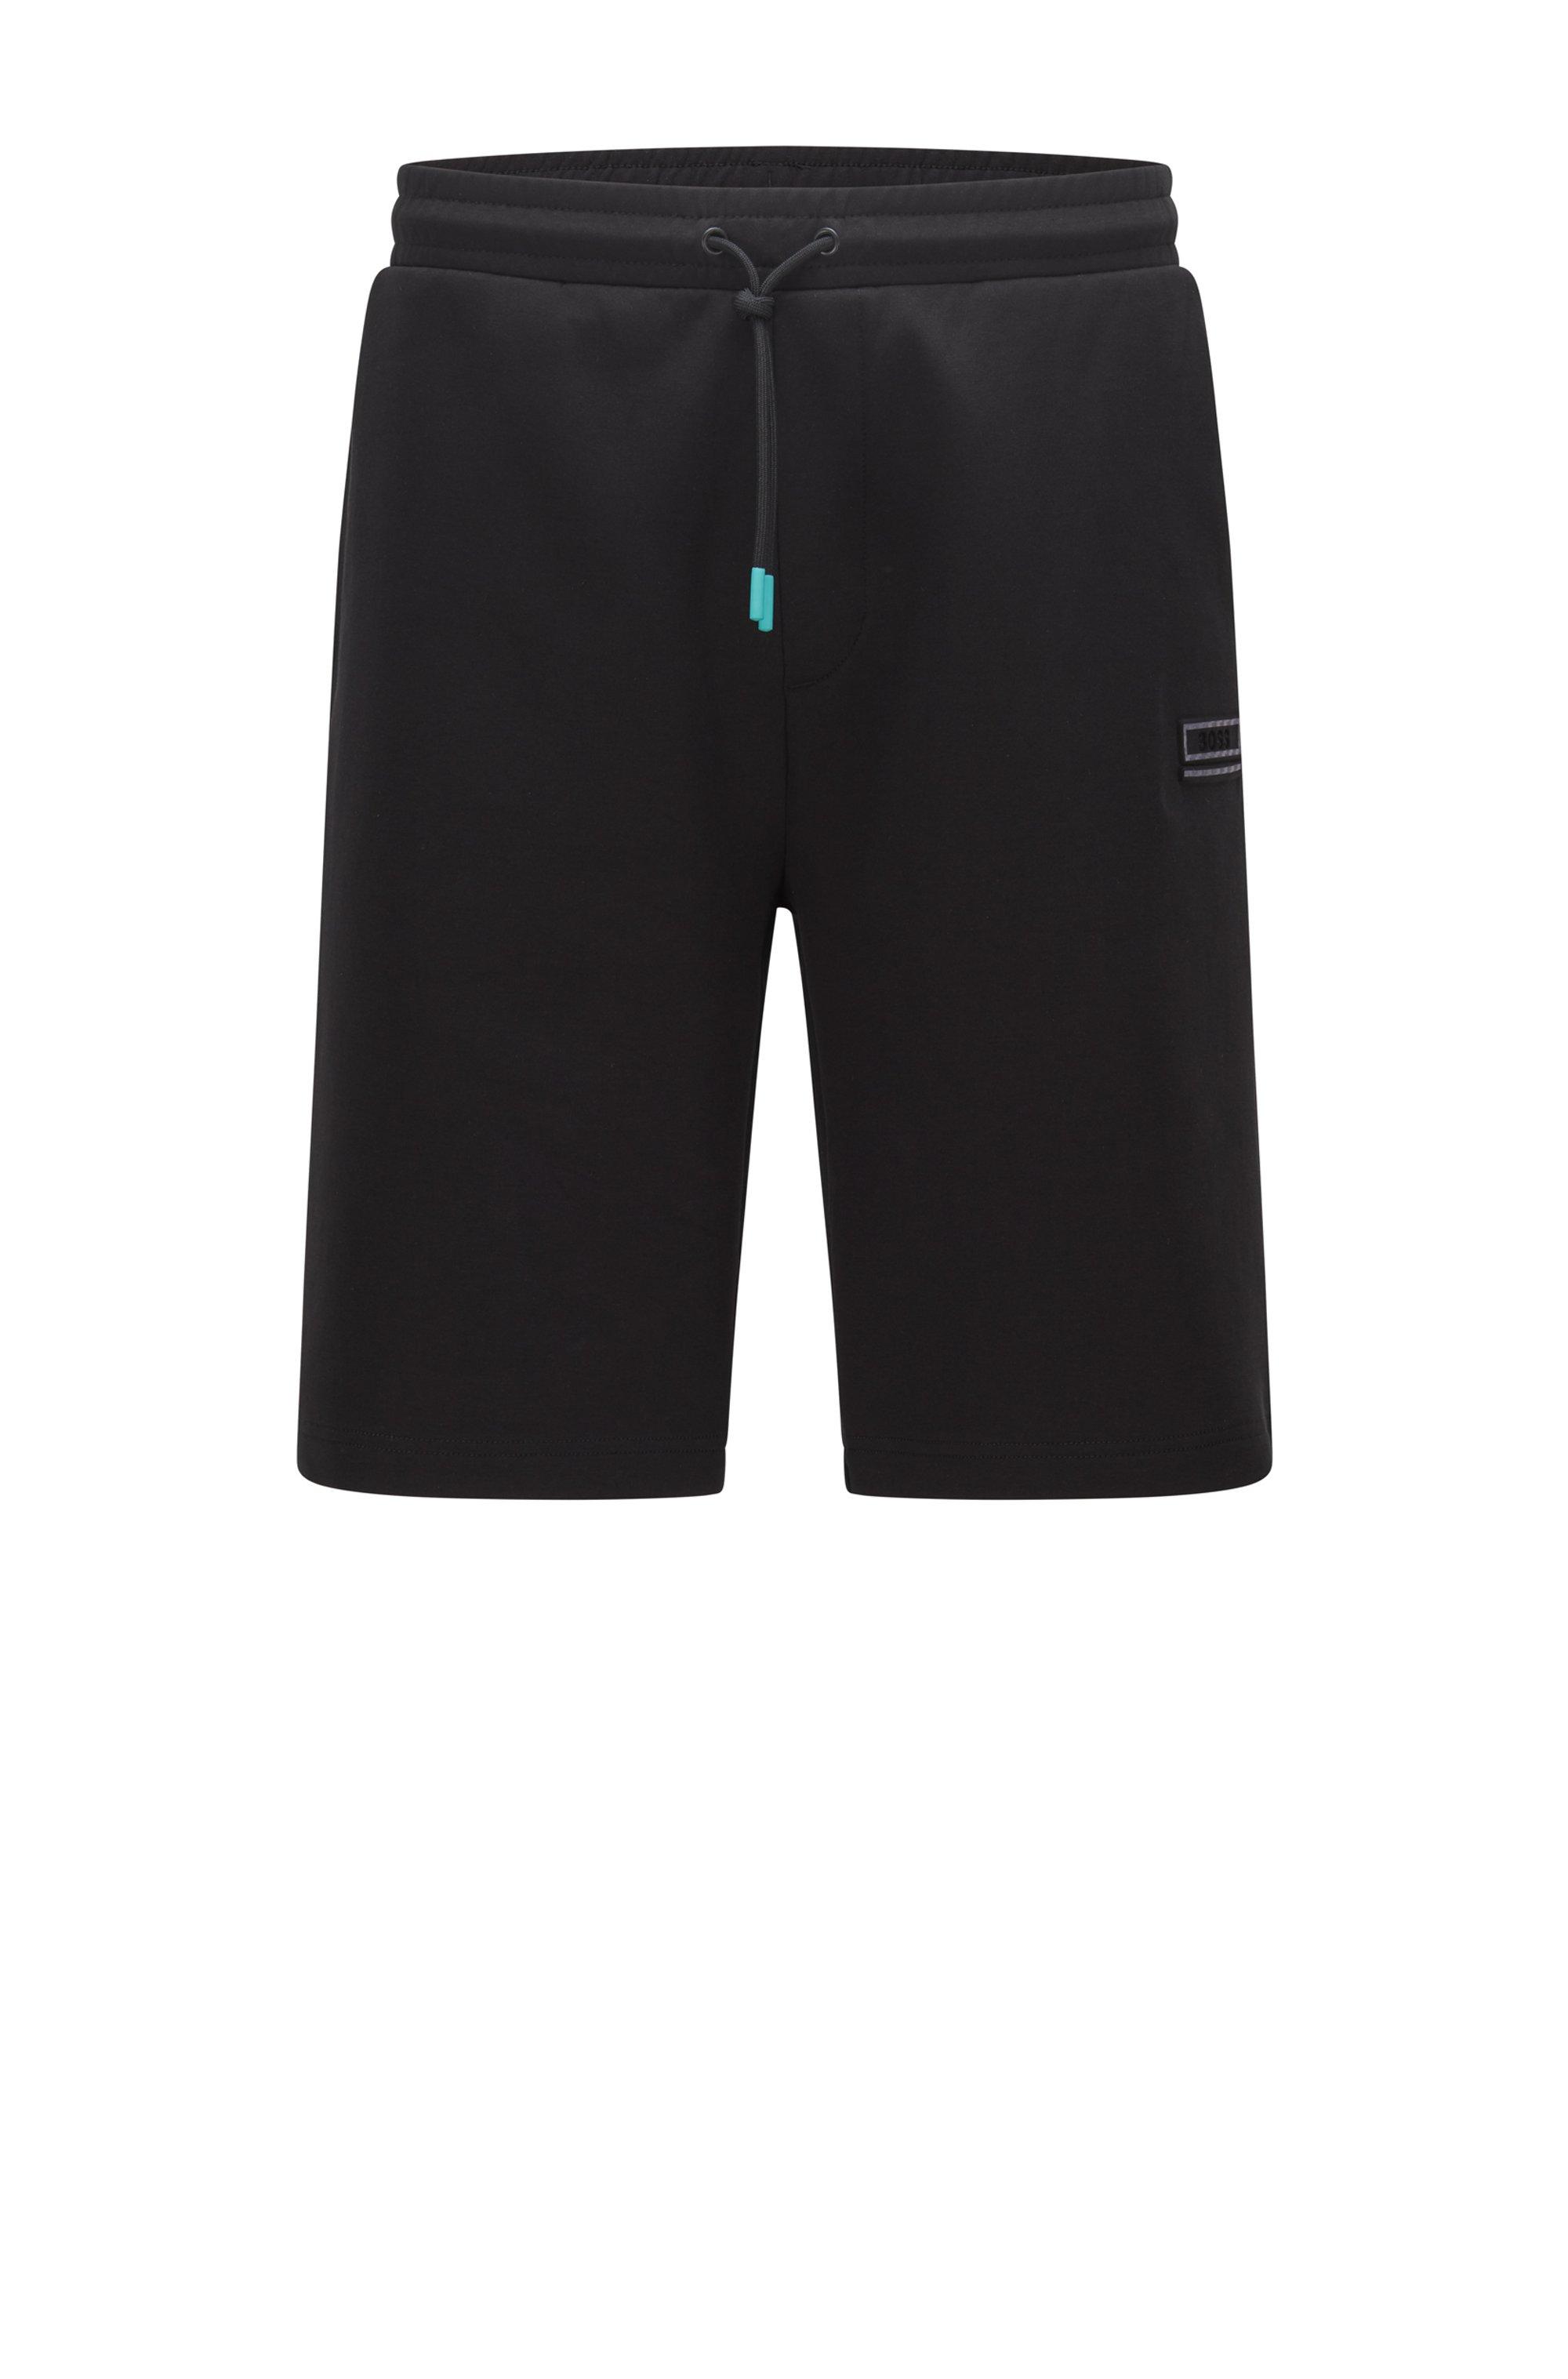 Short Relaxed Fit avec logo brodé, Noir